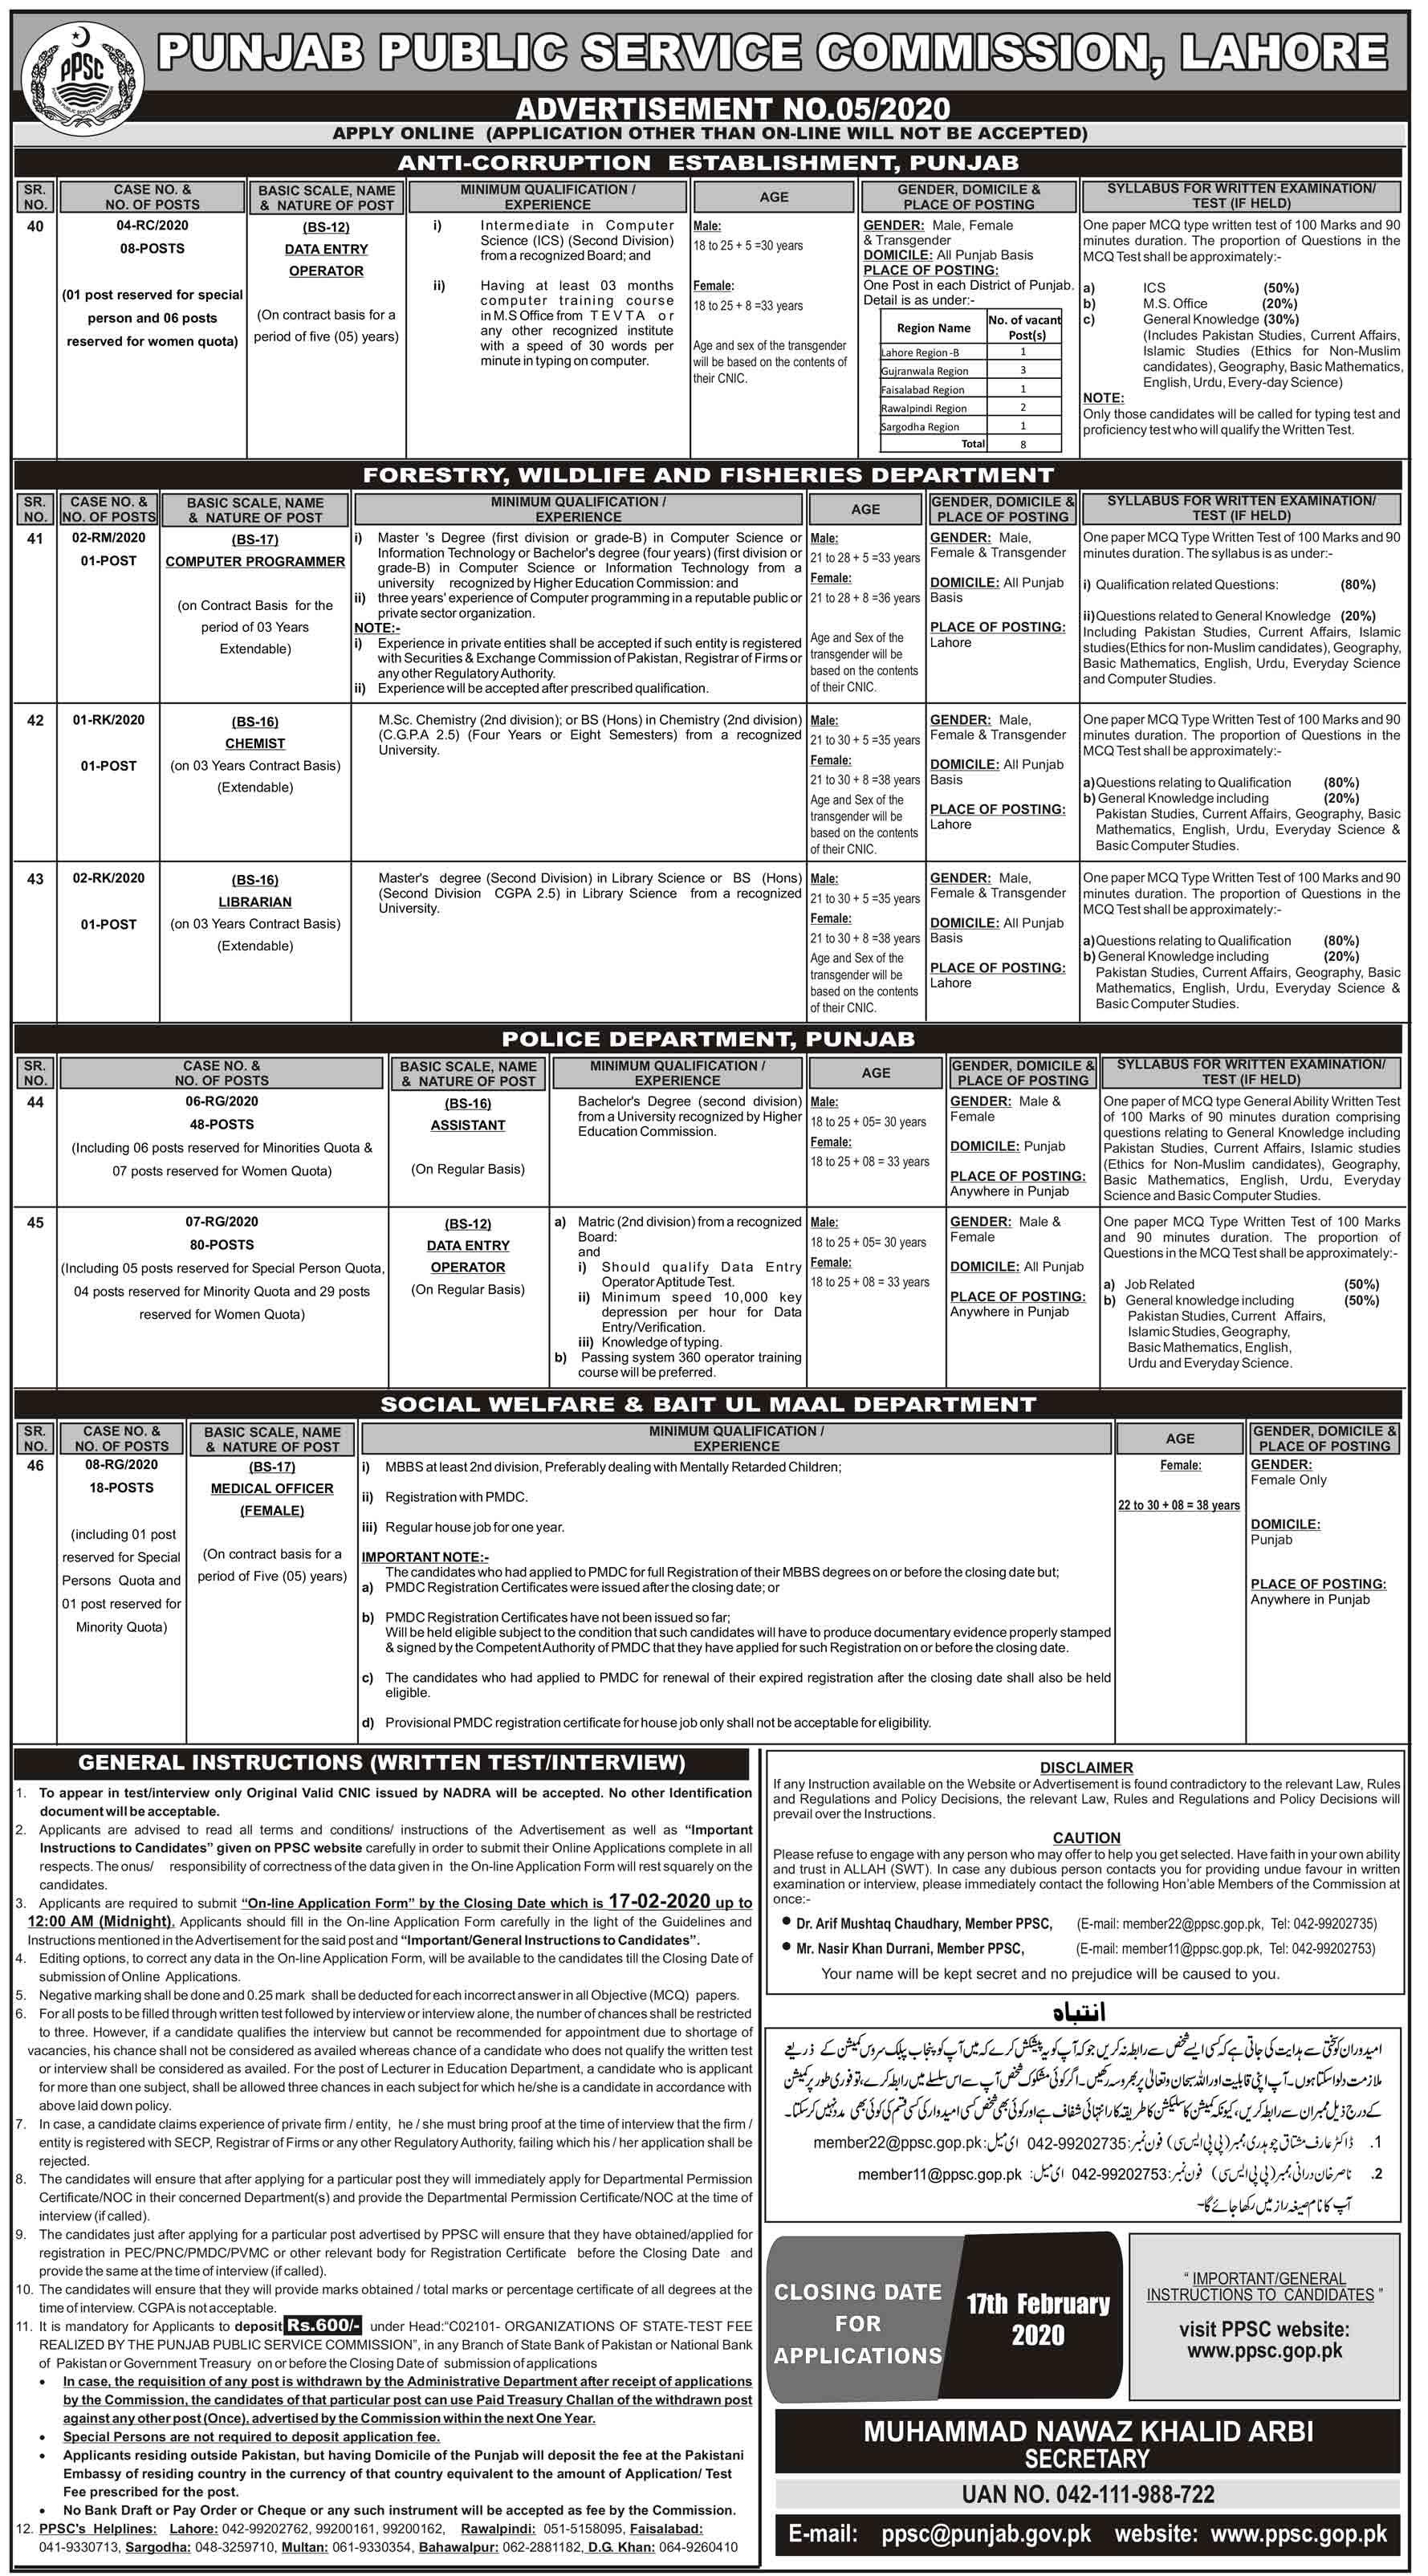 PPSC Jobs 2020 Latest - Advertisement No.052020